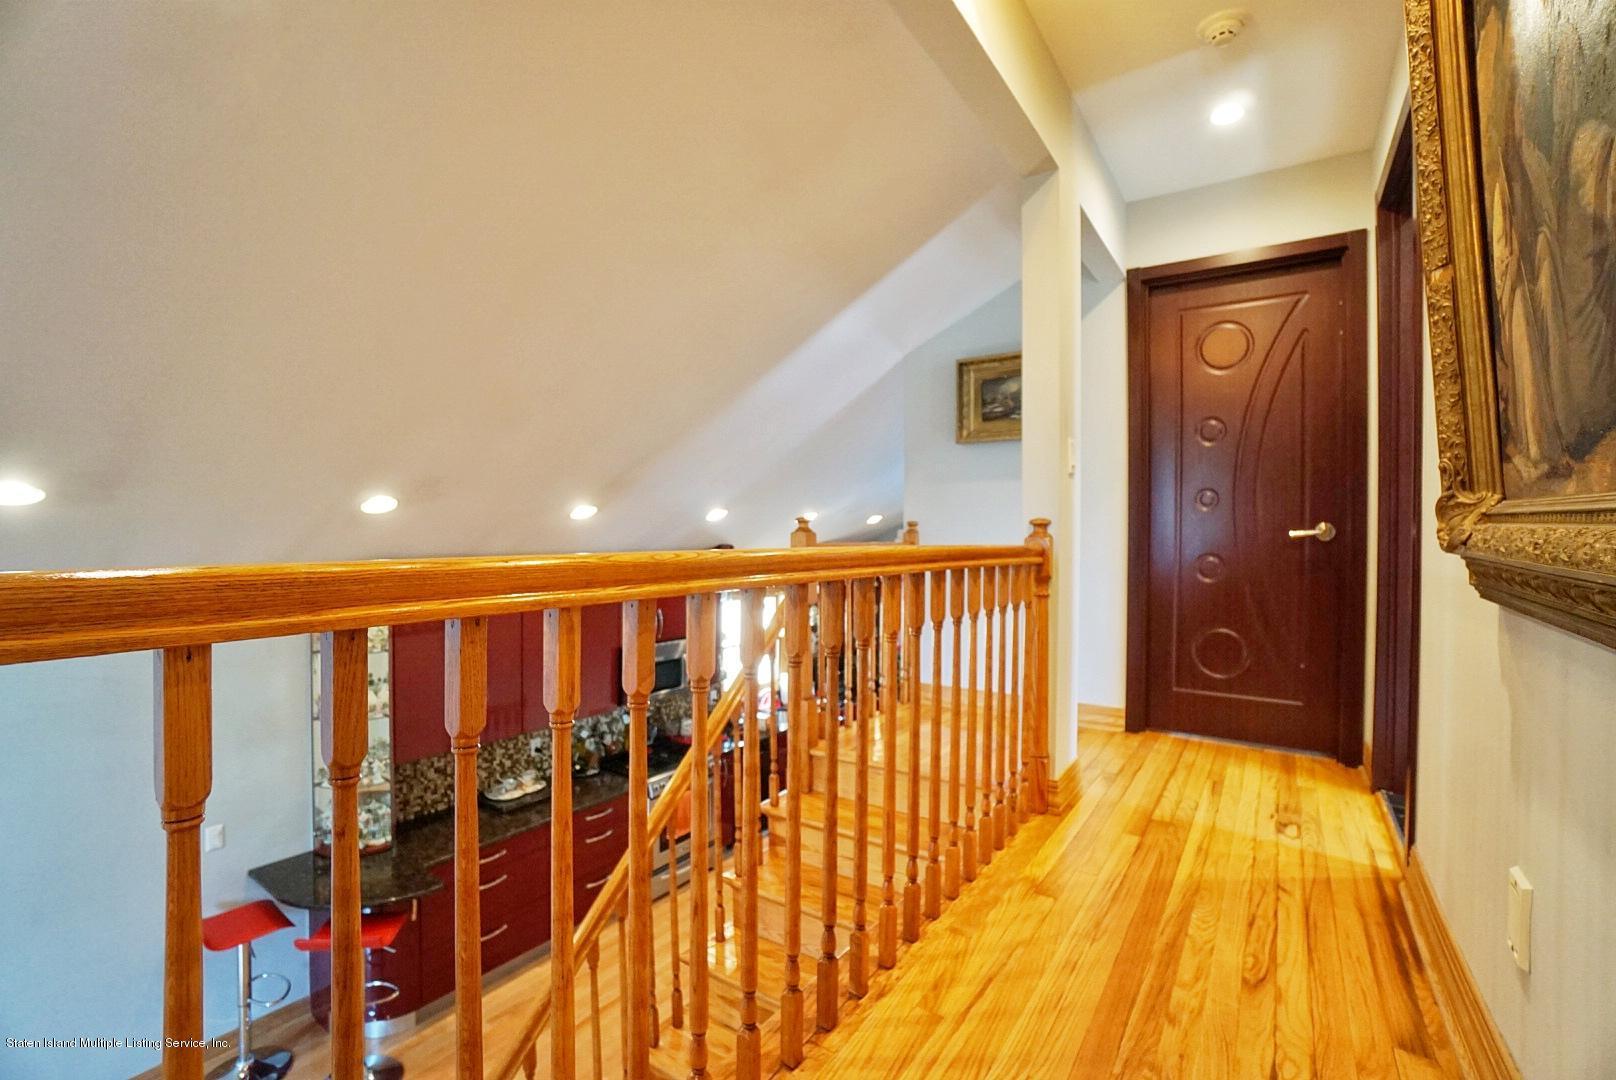 Single Family - Detached 48 Ocean Terrace  Staten Island, NY 10314, MLS-1130826-41